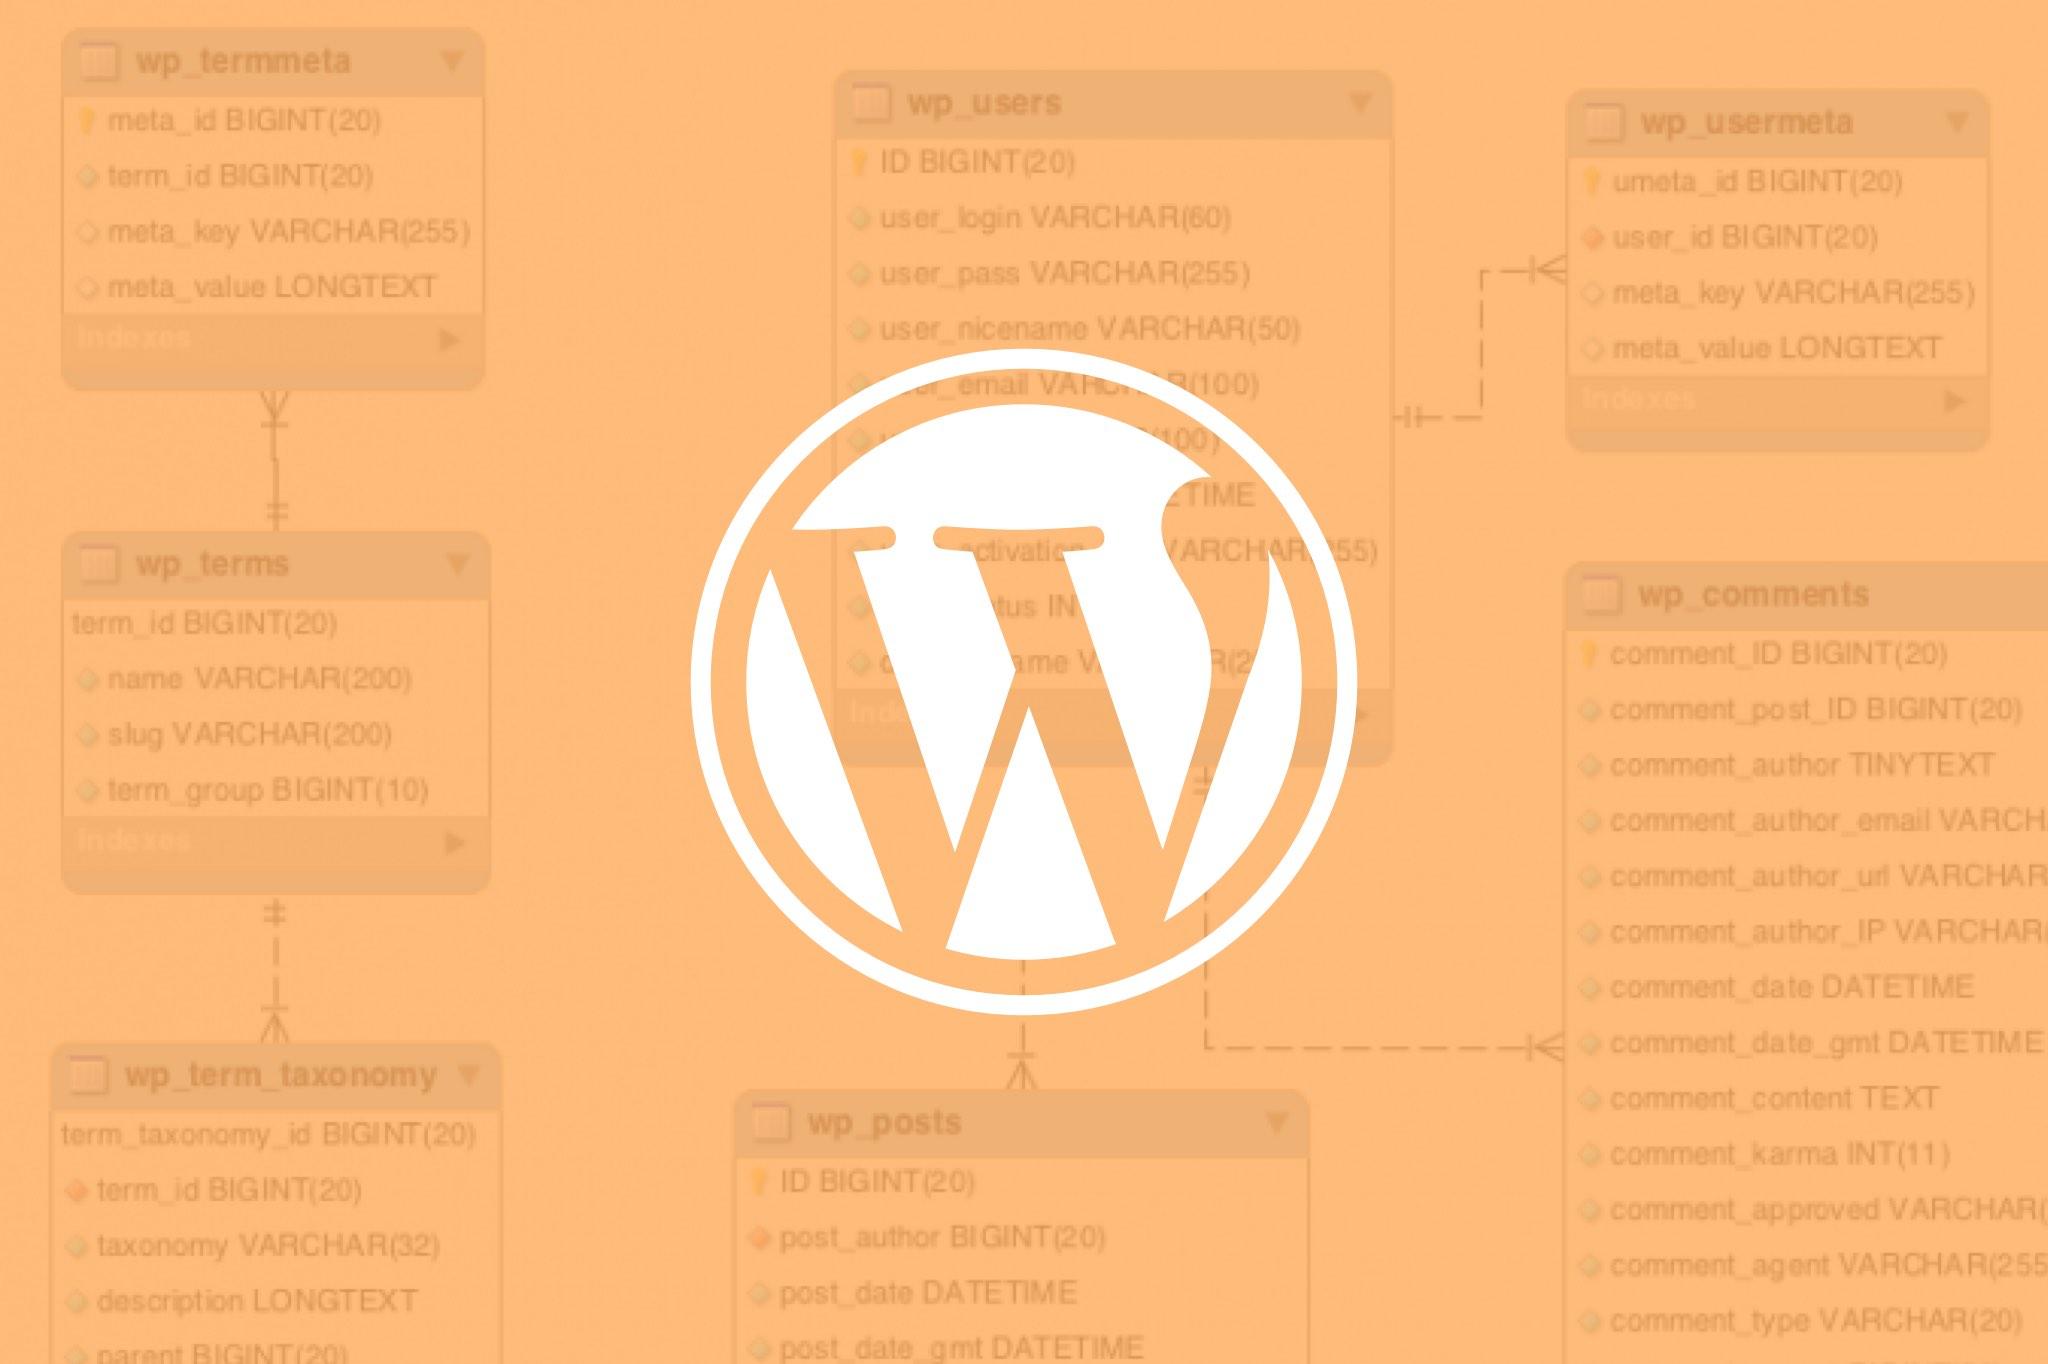 wordpress base de datos